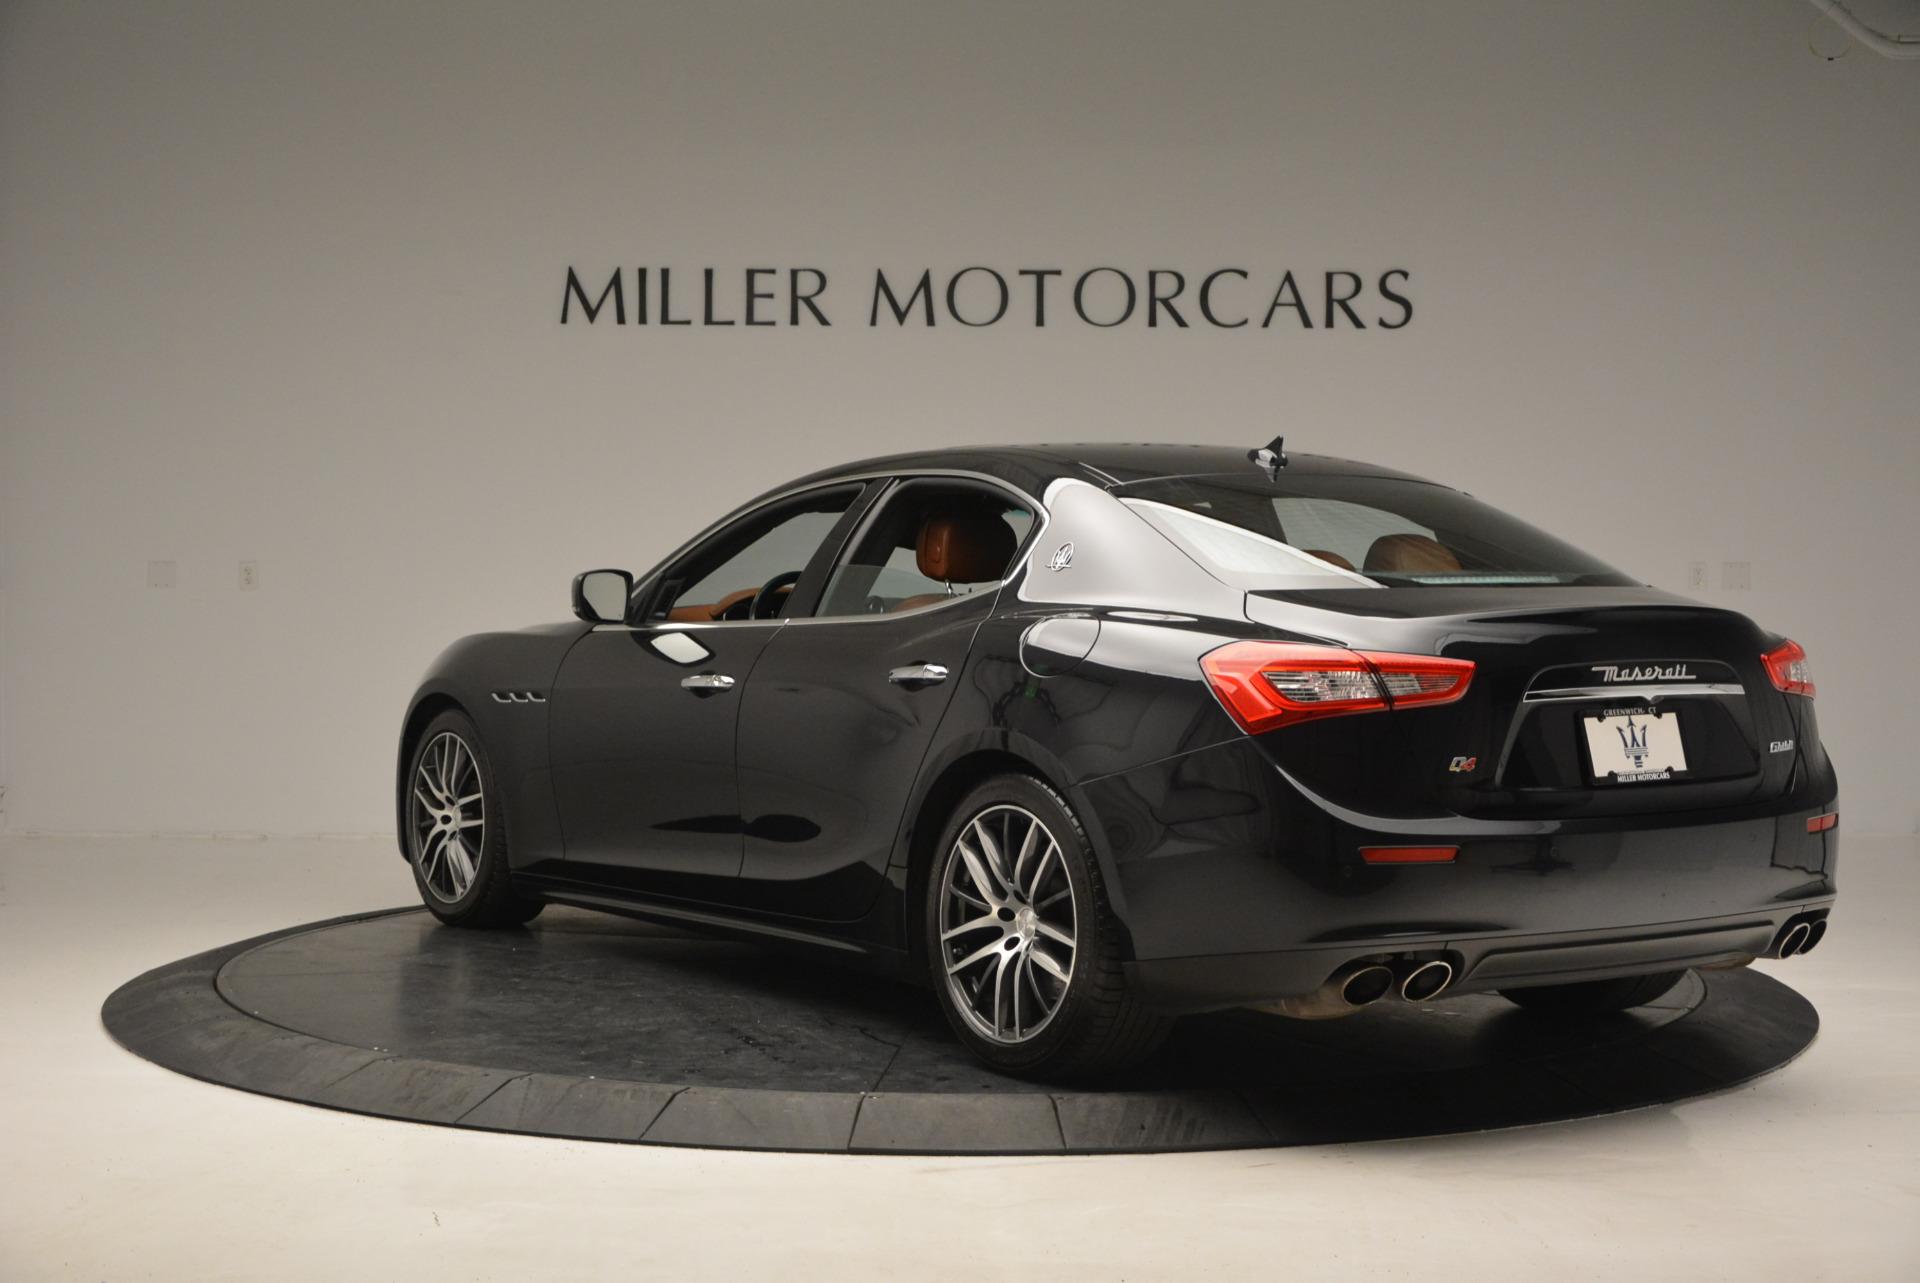 Used 2014 Maserati Ghibli S Q4 For Sale In Greenwich, CT. Alfa Romeo of Greenwich, 7132 805_p5